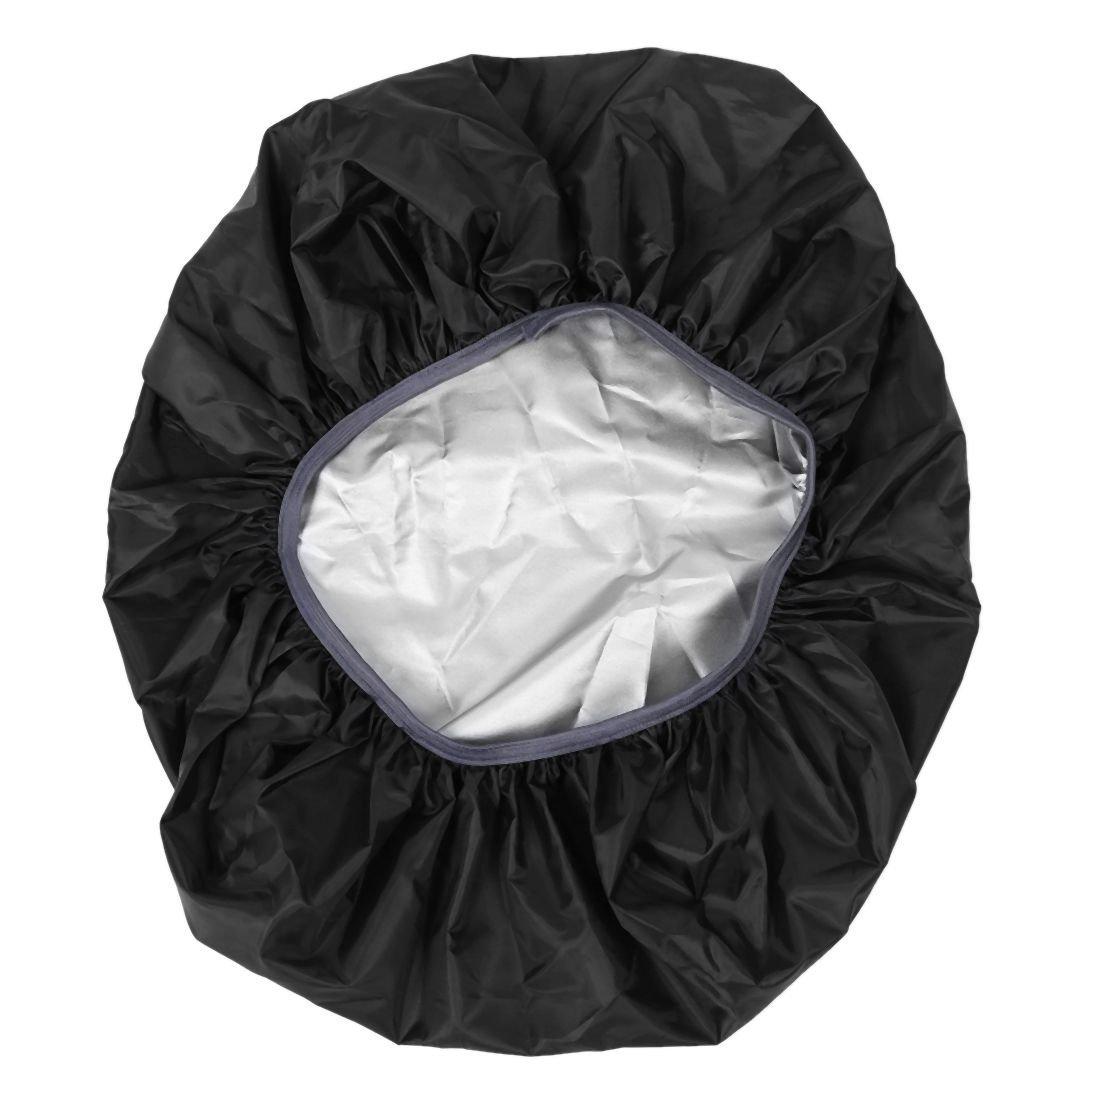 TOOGOO(R) New Waterproof Travel Hiking Accessory Backpack Camping Dust Rain Cover 35L,Black